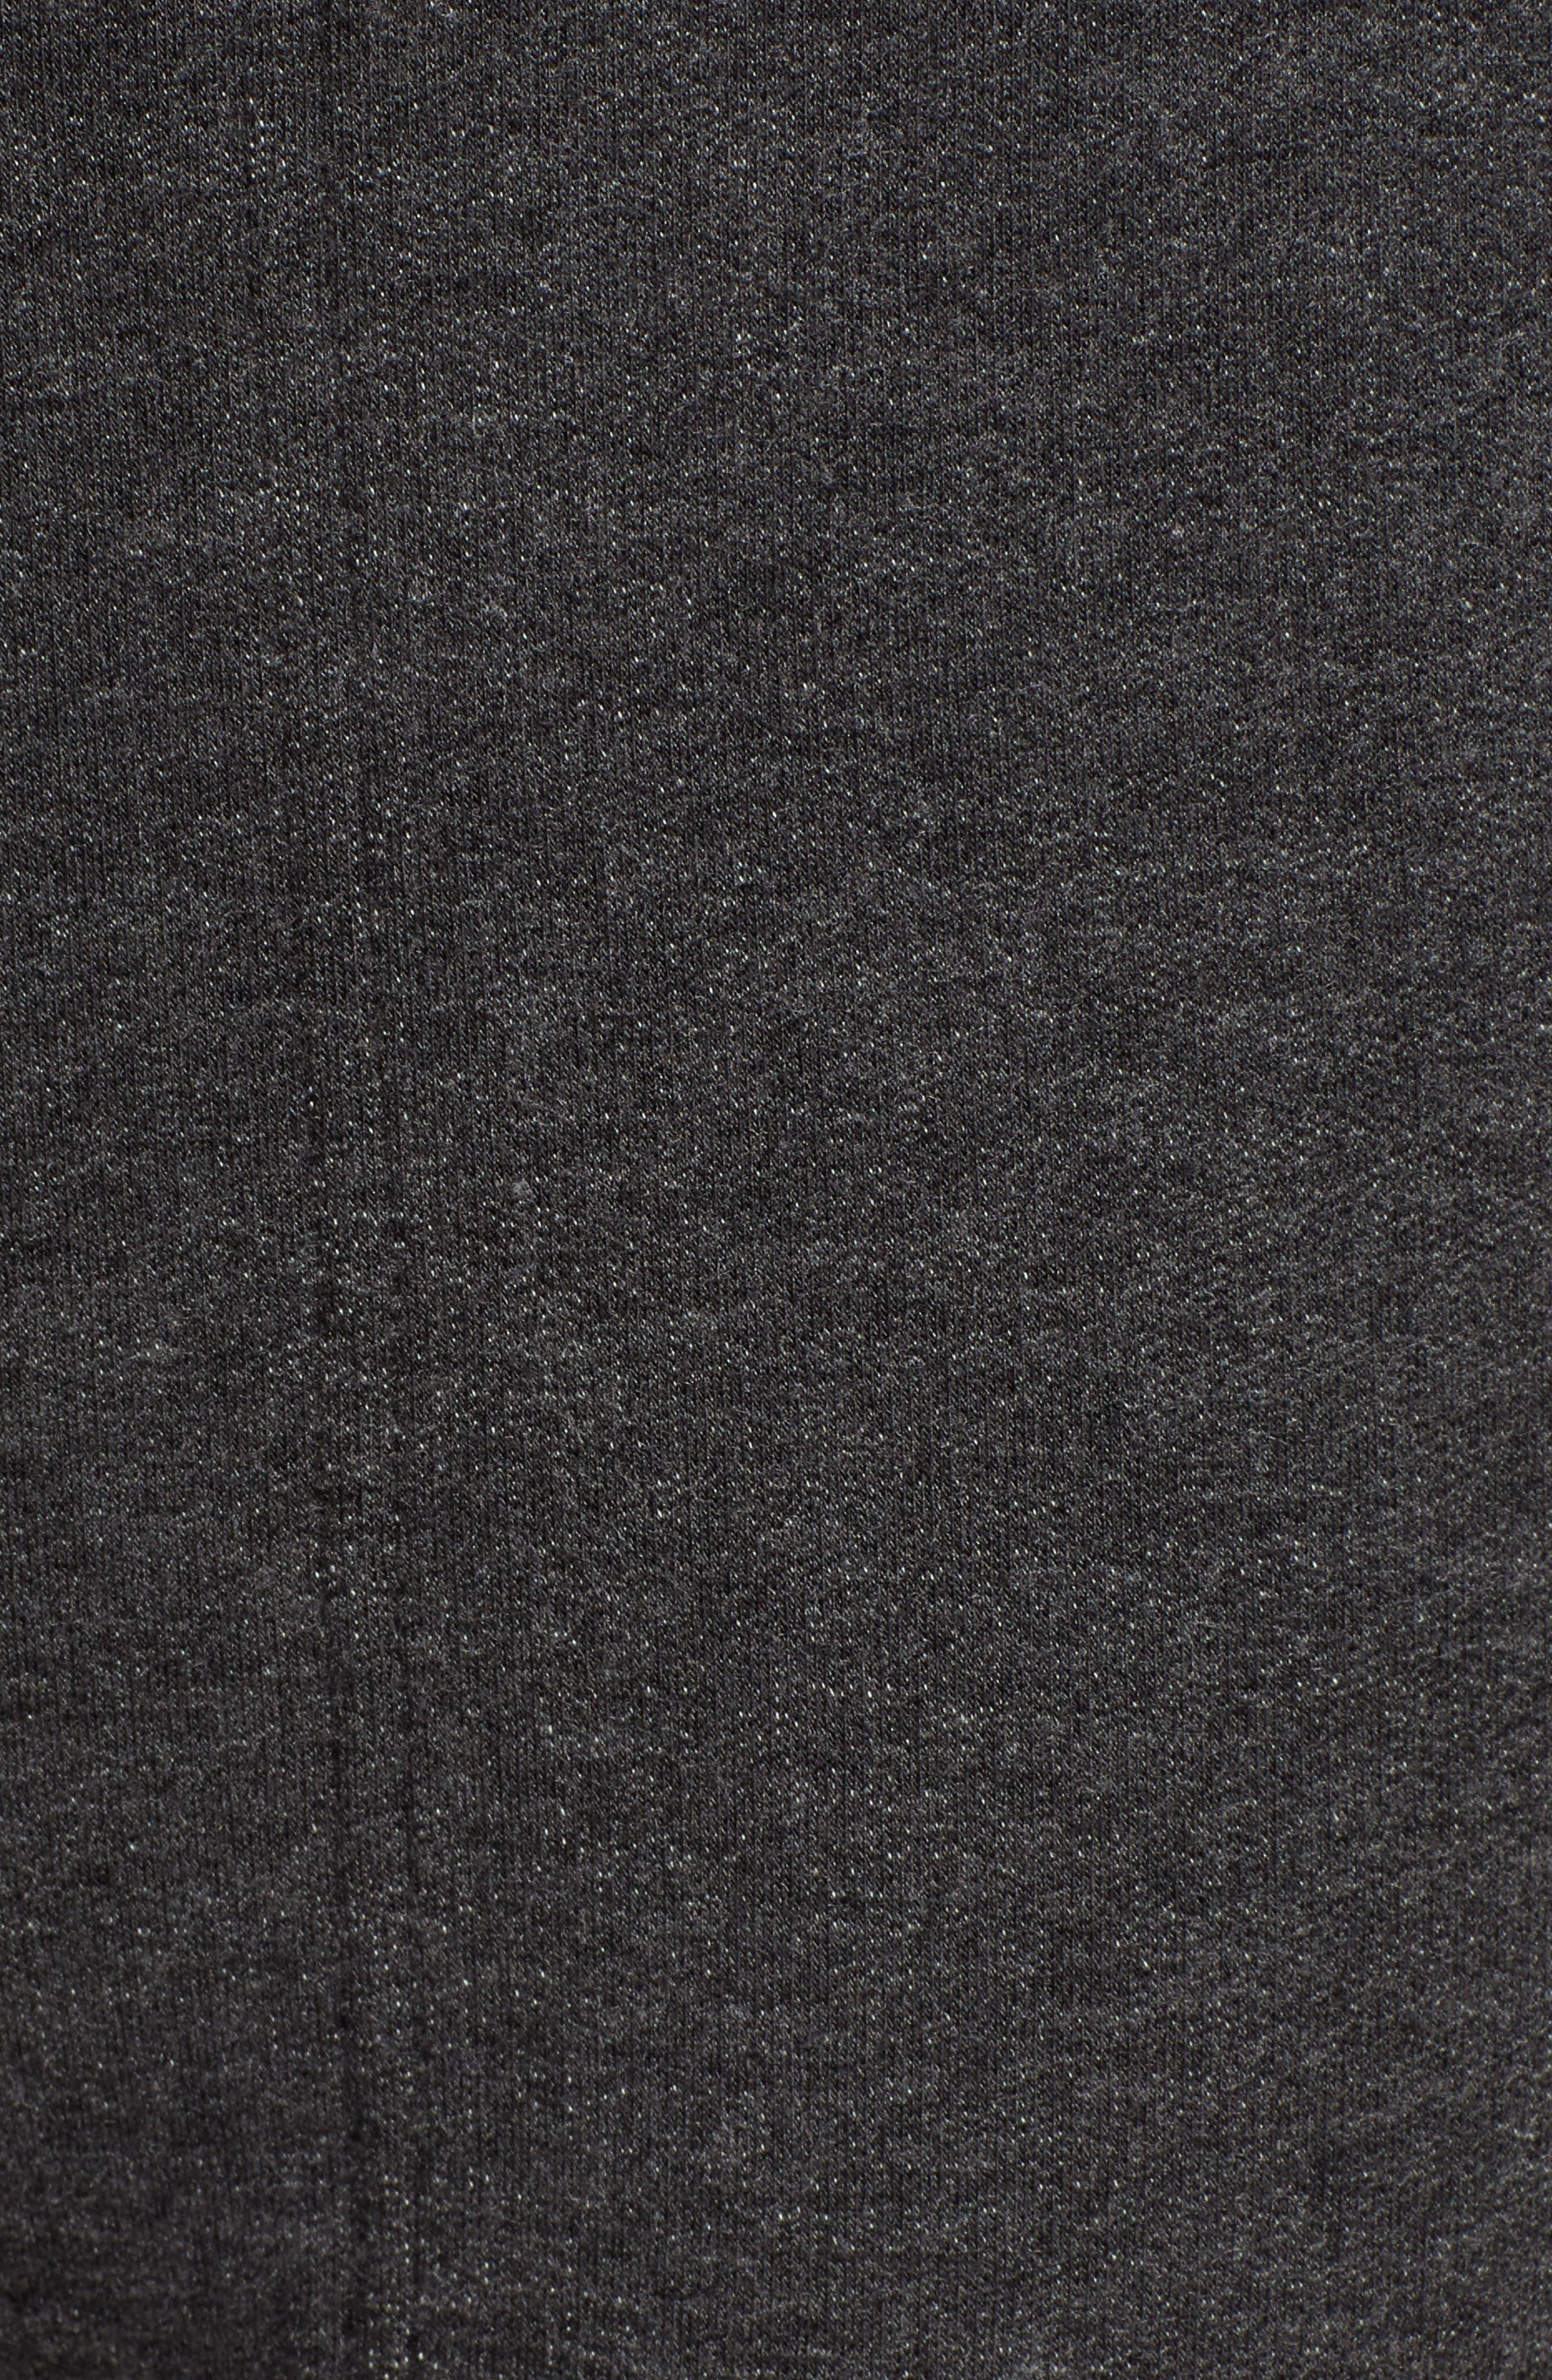 Zen Bounce Upstate Sweatpants,                             Alternate thumbnail 6, color,                             CHARCOAL